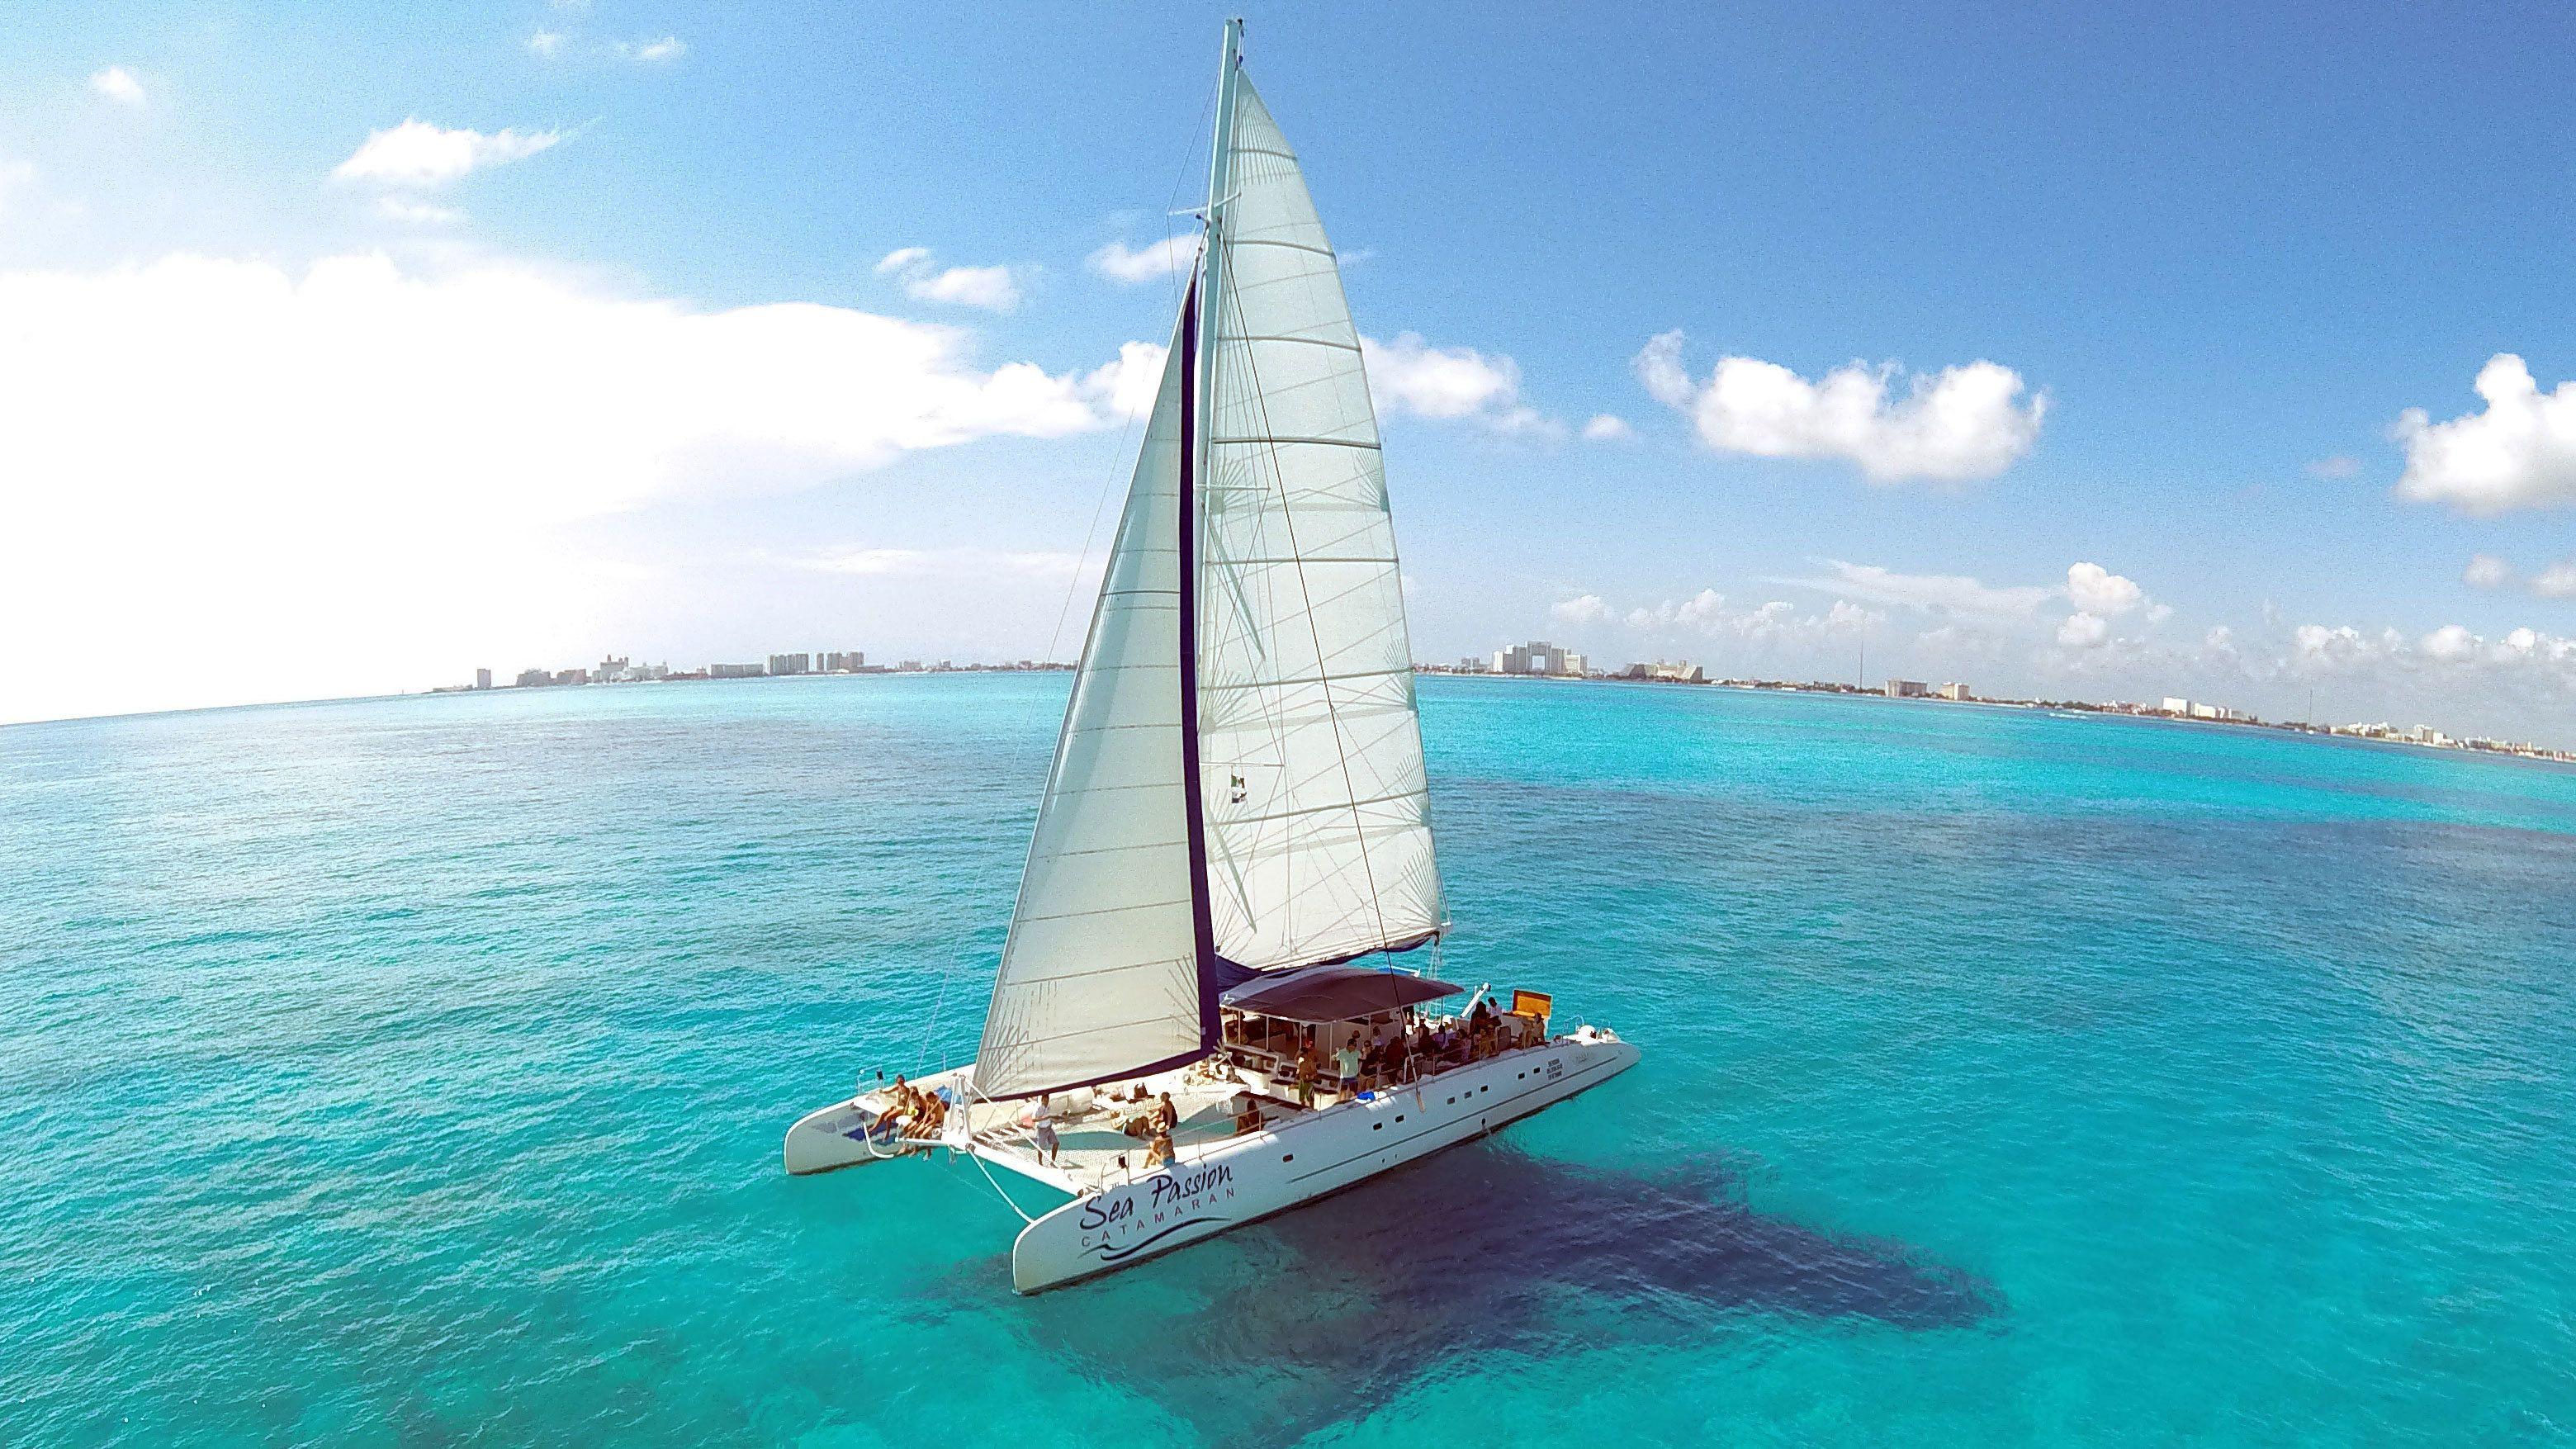 Catamaran on ocean